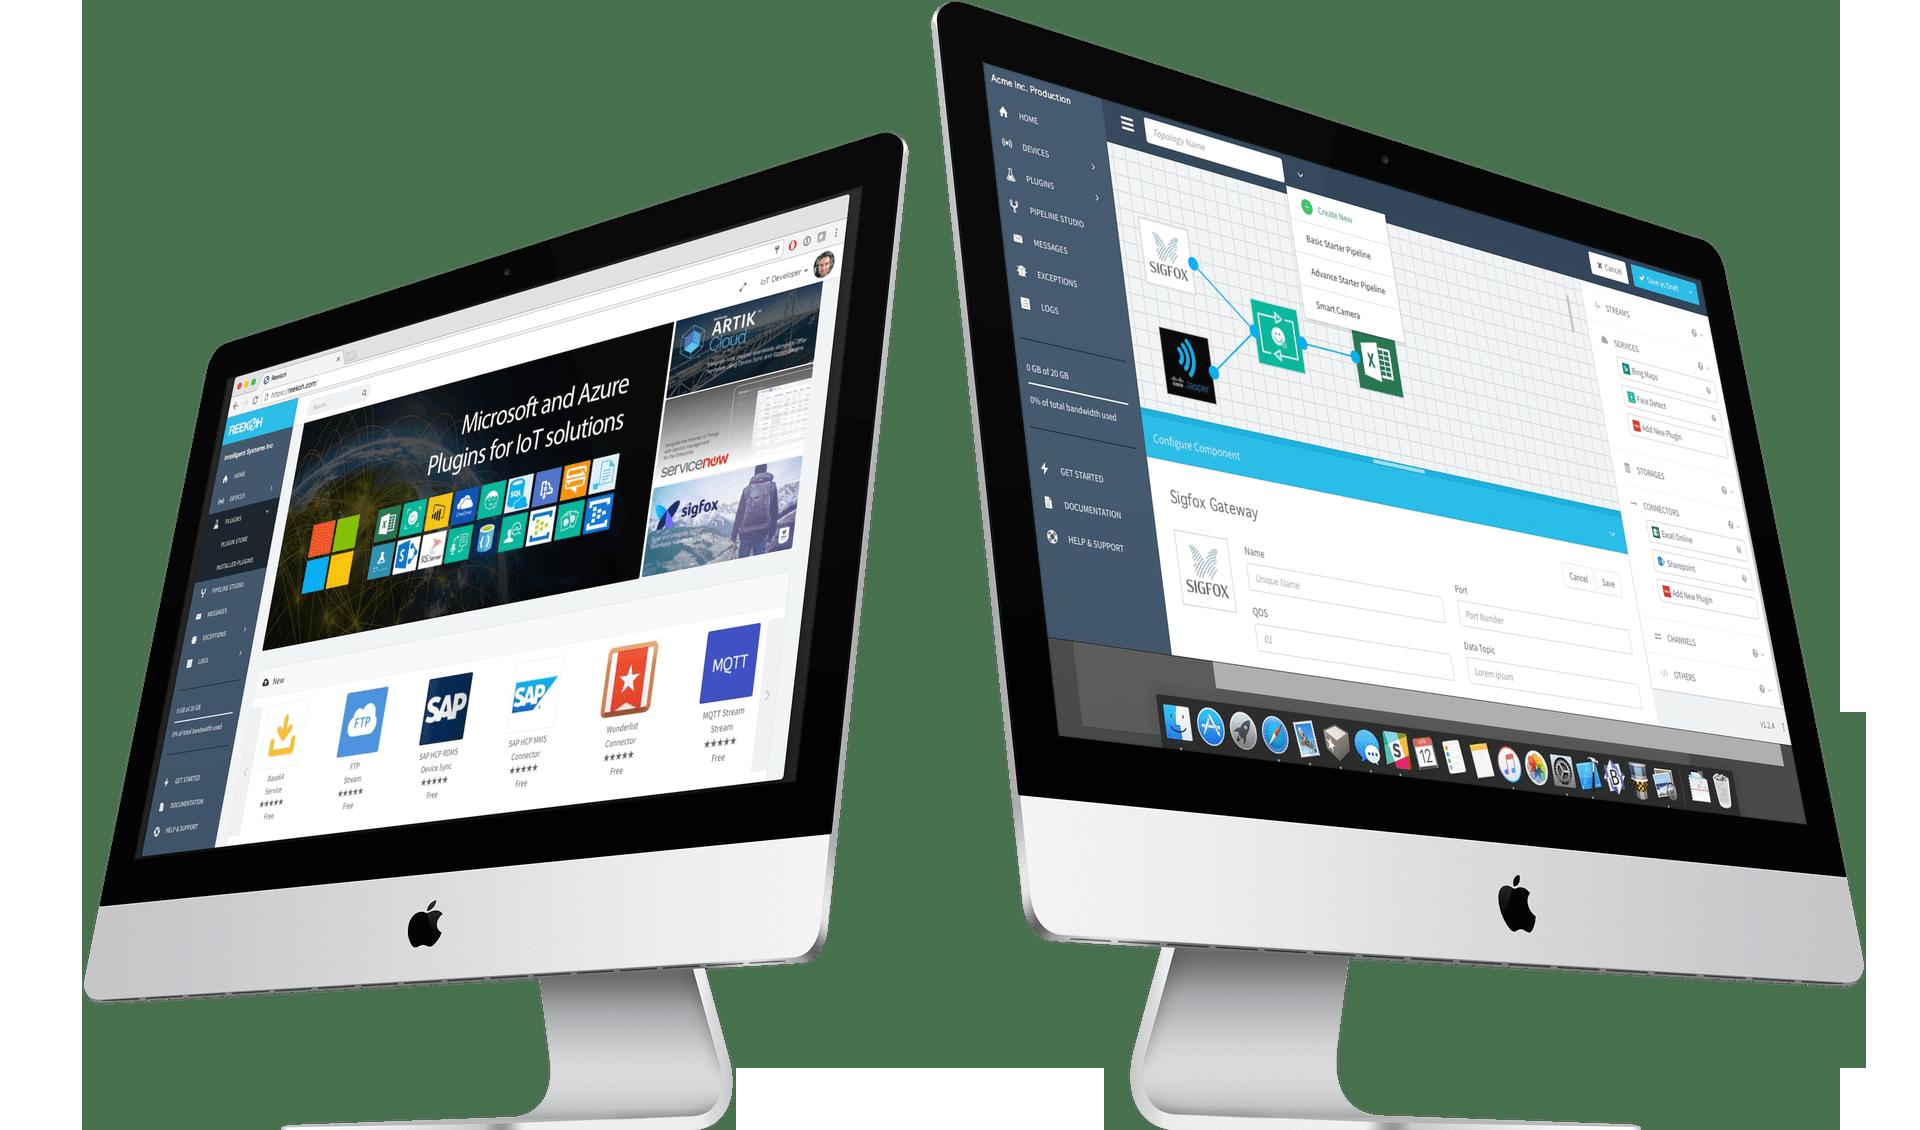 plugin-manager-screen